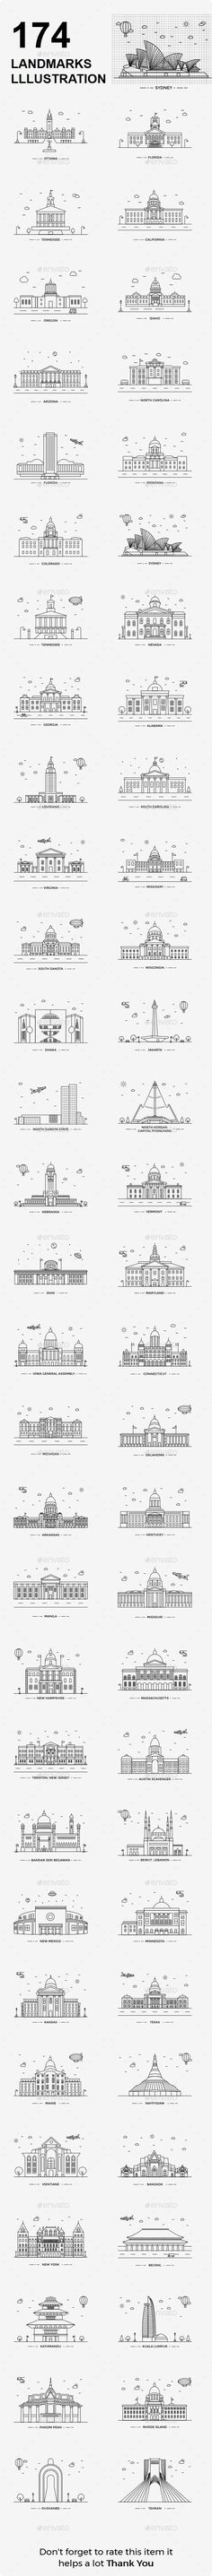 Capital Landmarks Illustration - Icons